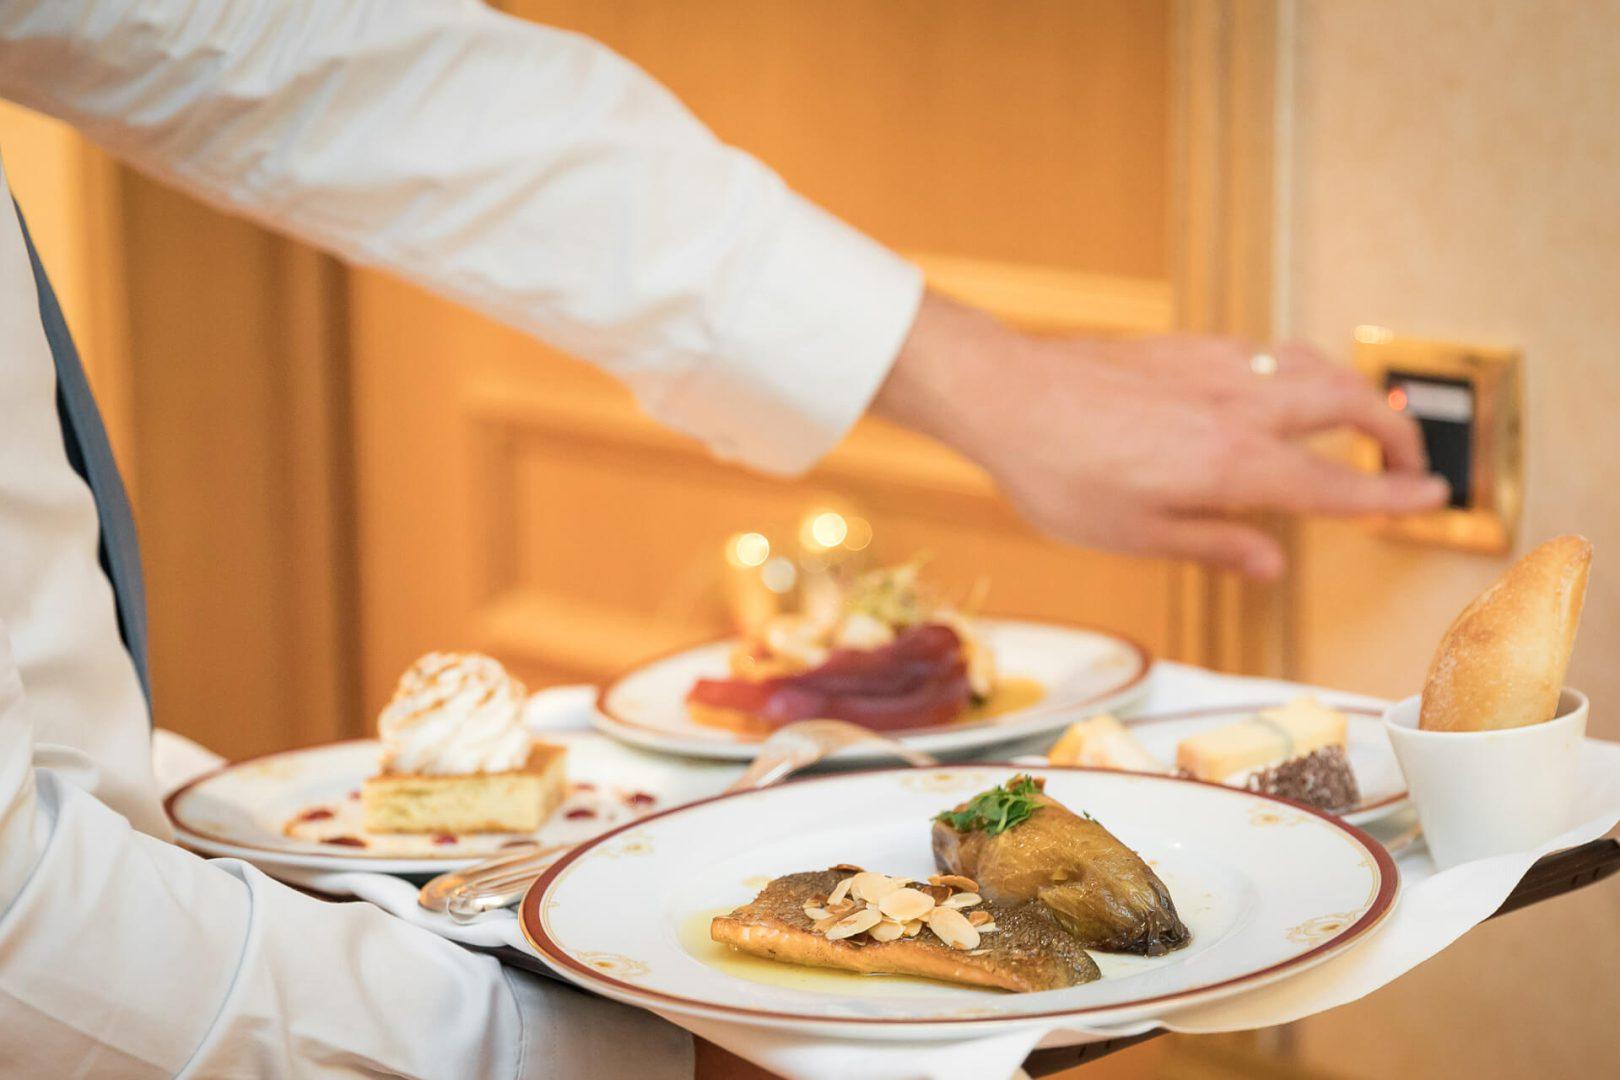 Service Résidence senior Restaurant - Serveurs avec plats